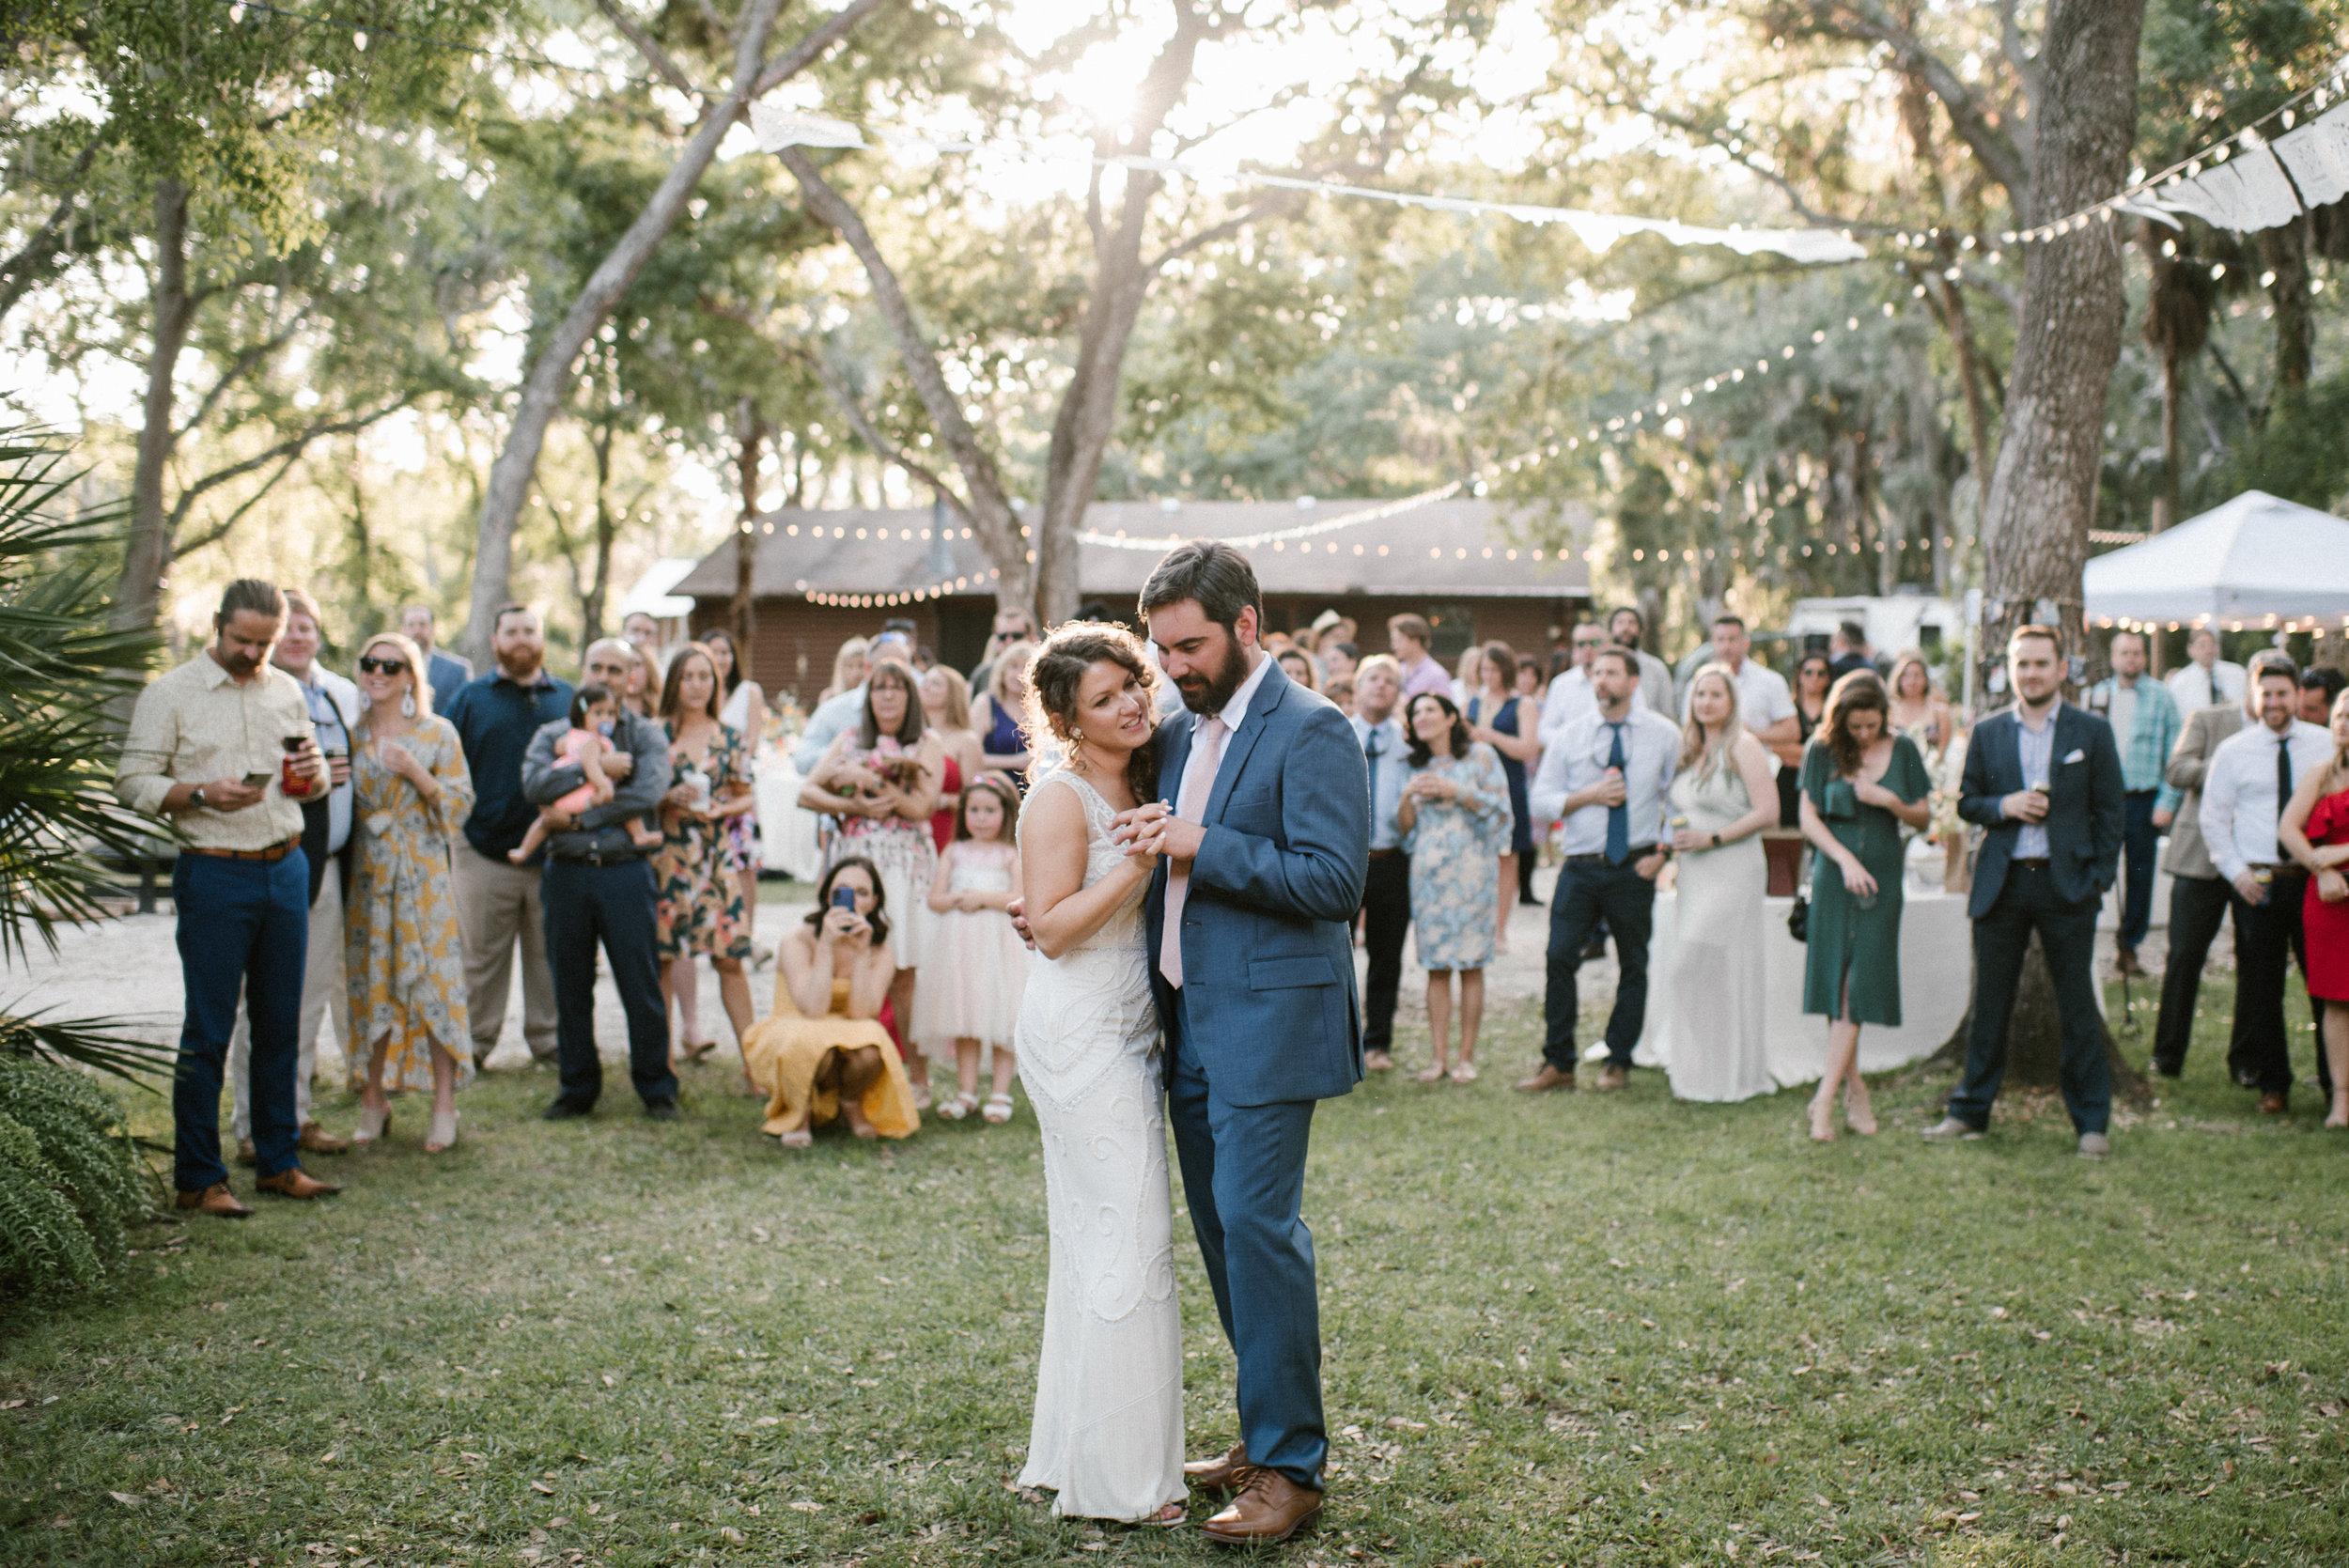 mclaughlin-wedding-869.jpg